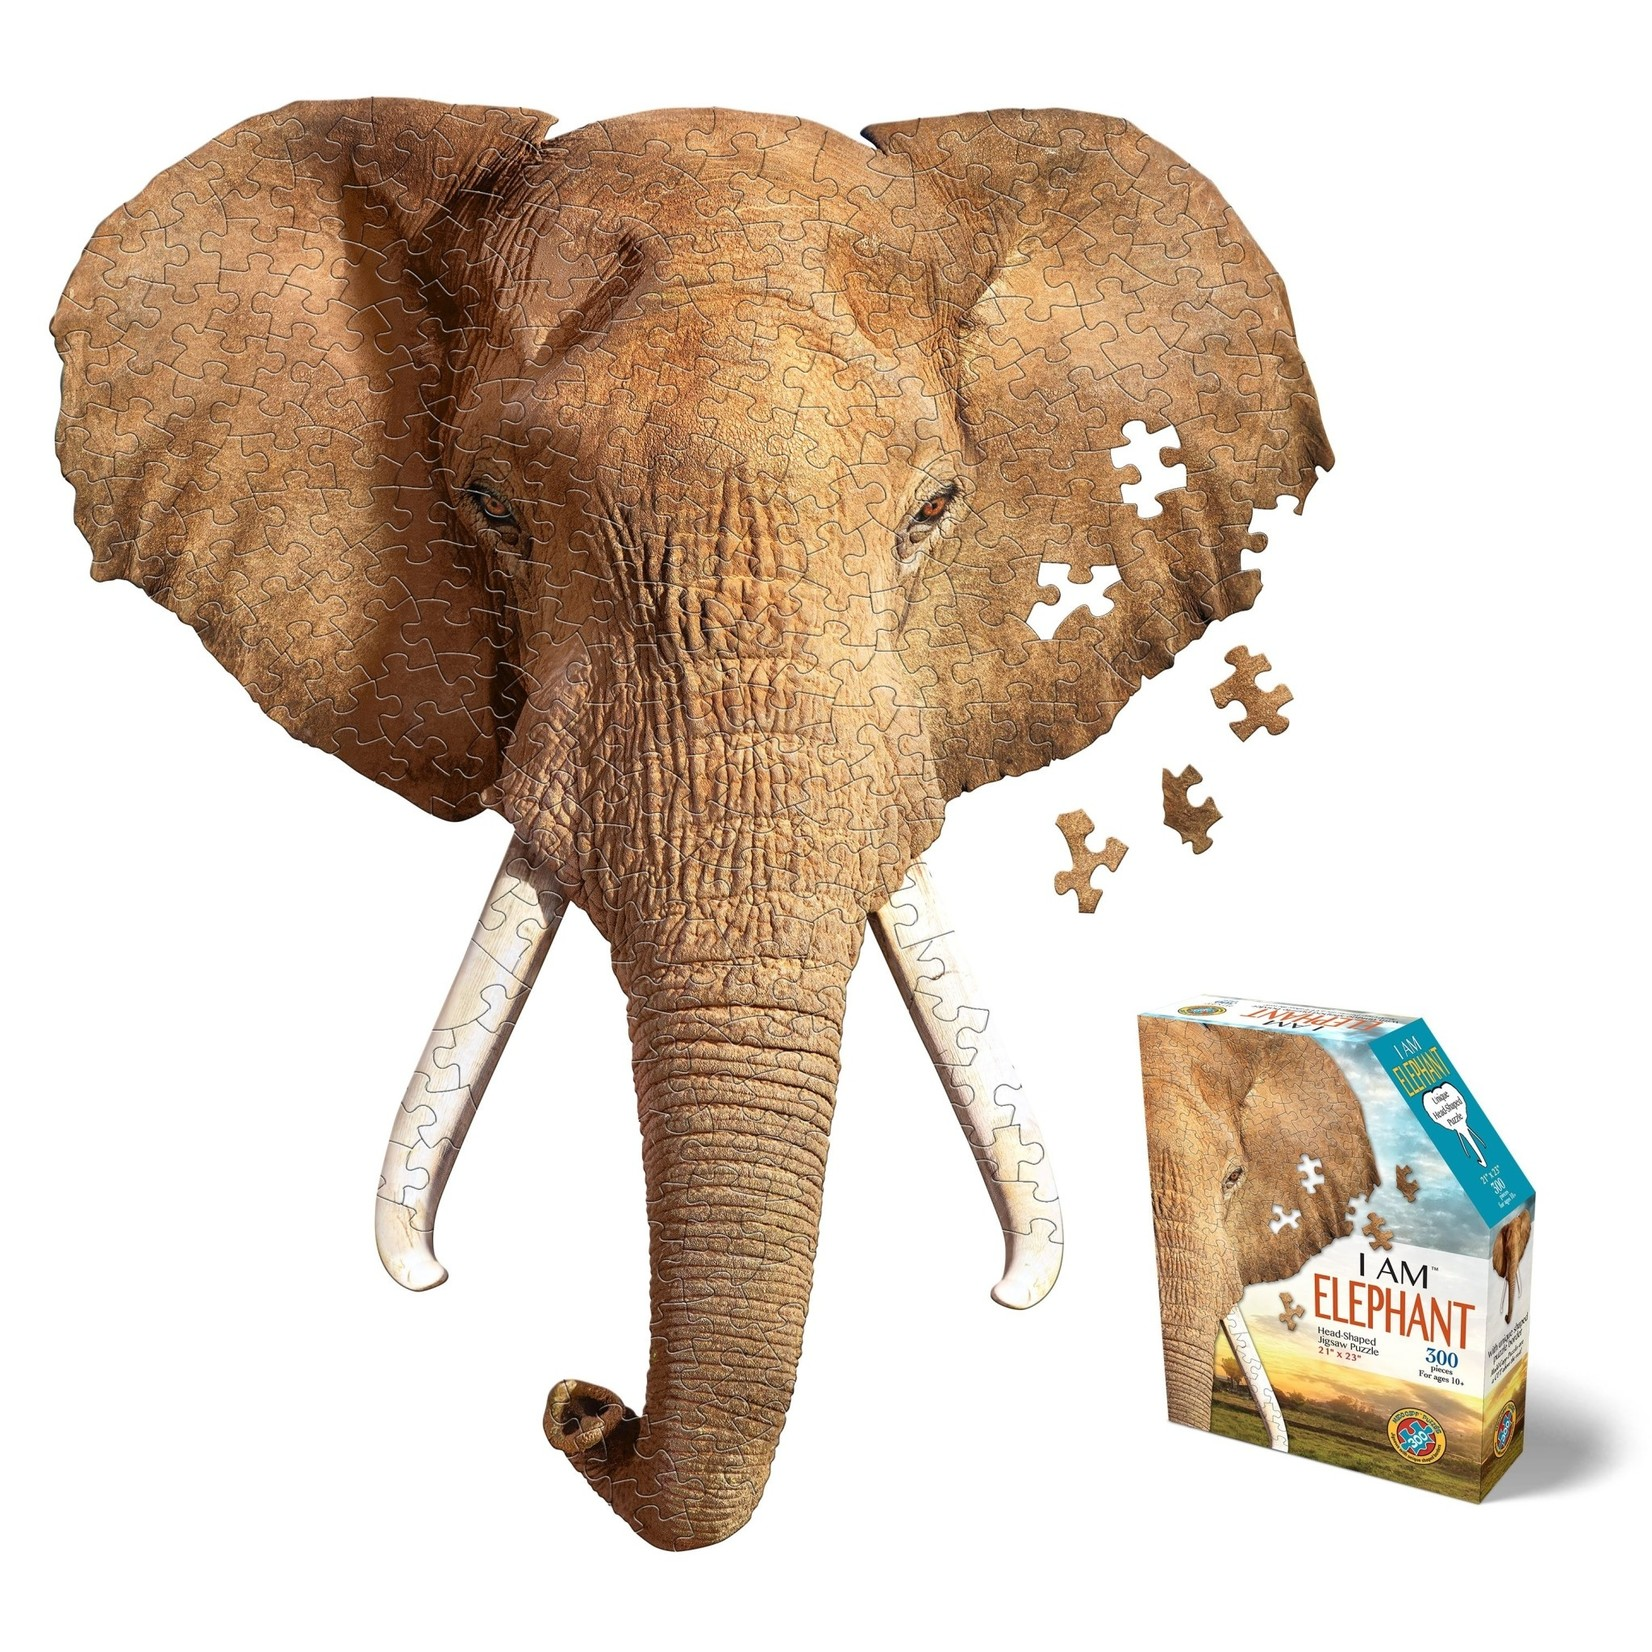 Madd Capp Games & Puzzles Madd Capp Puzzle 300pc I AM Elephant